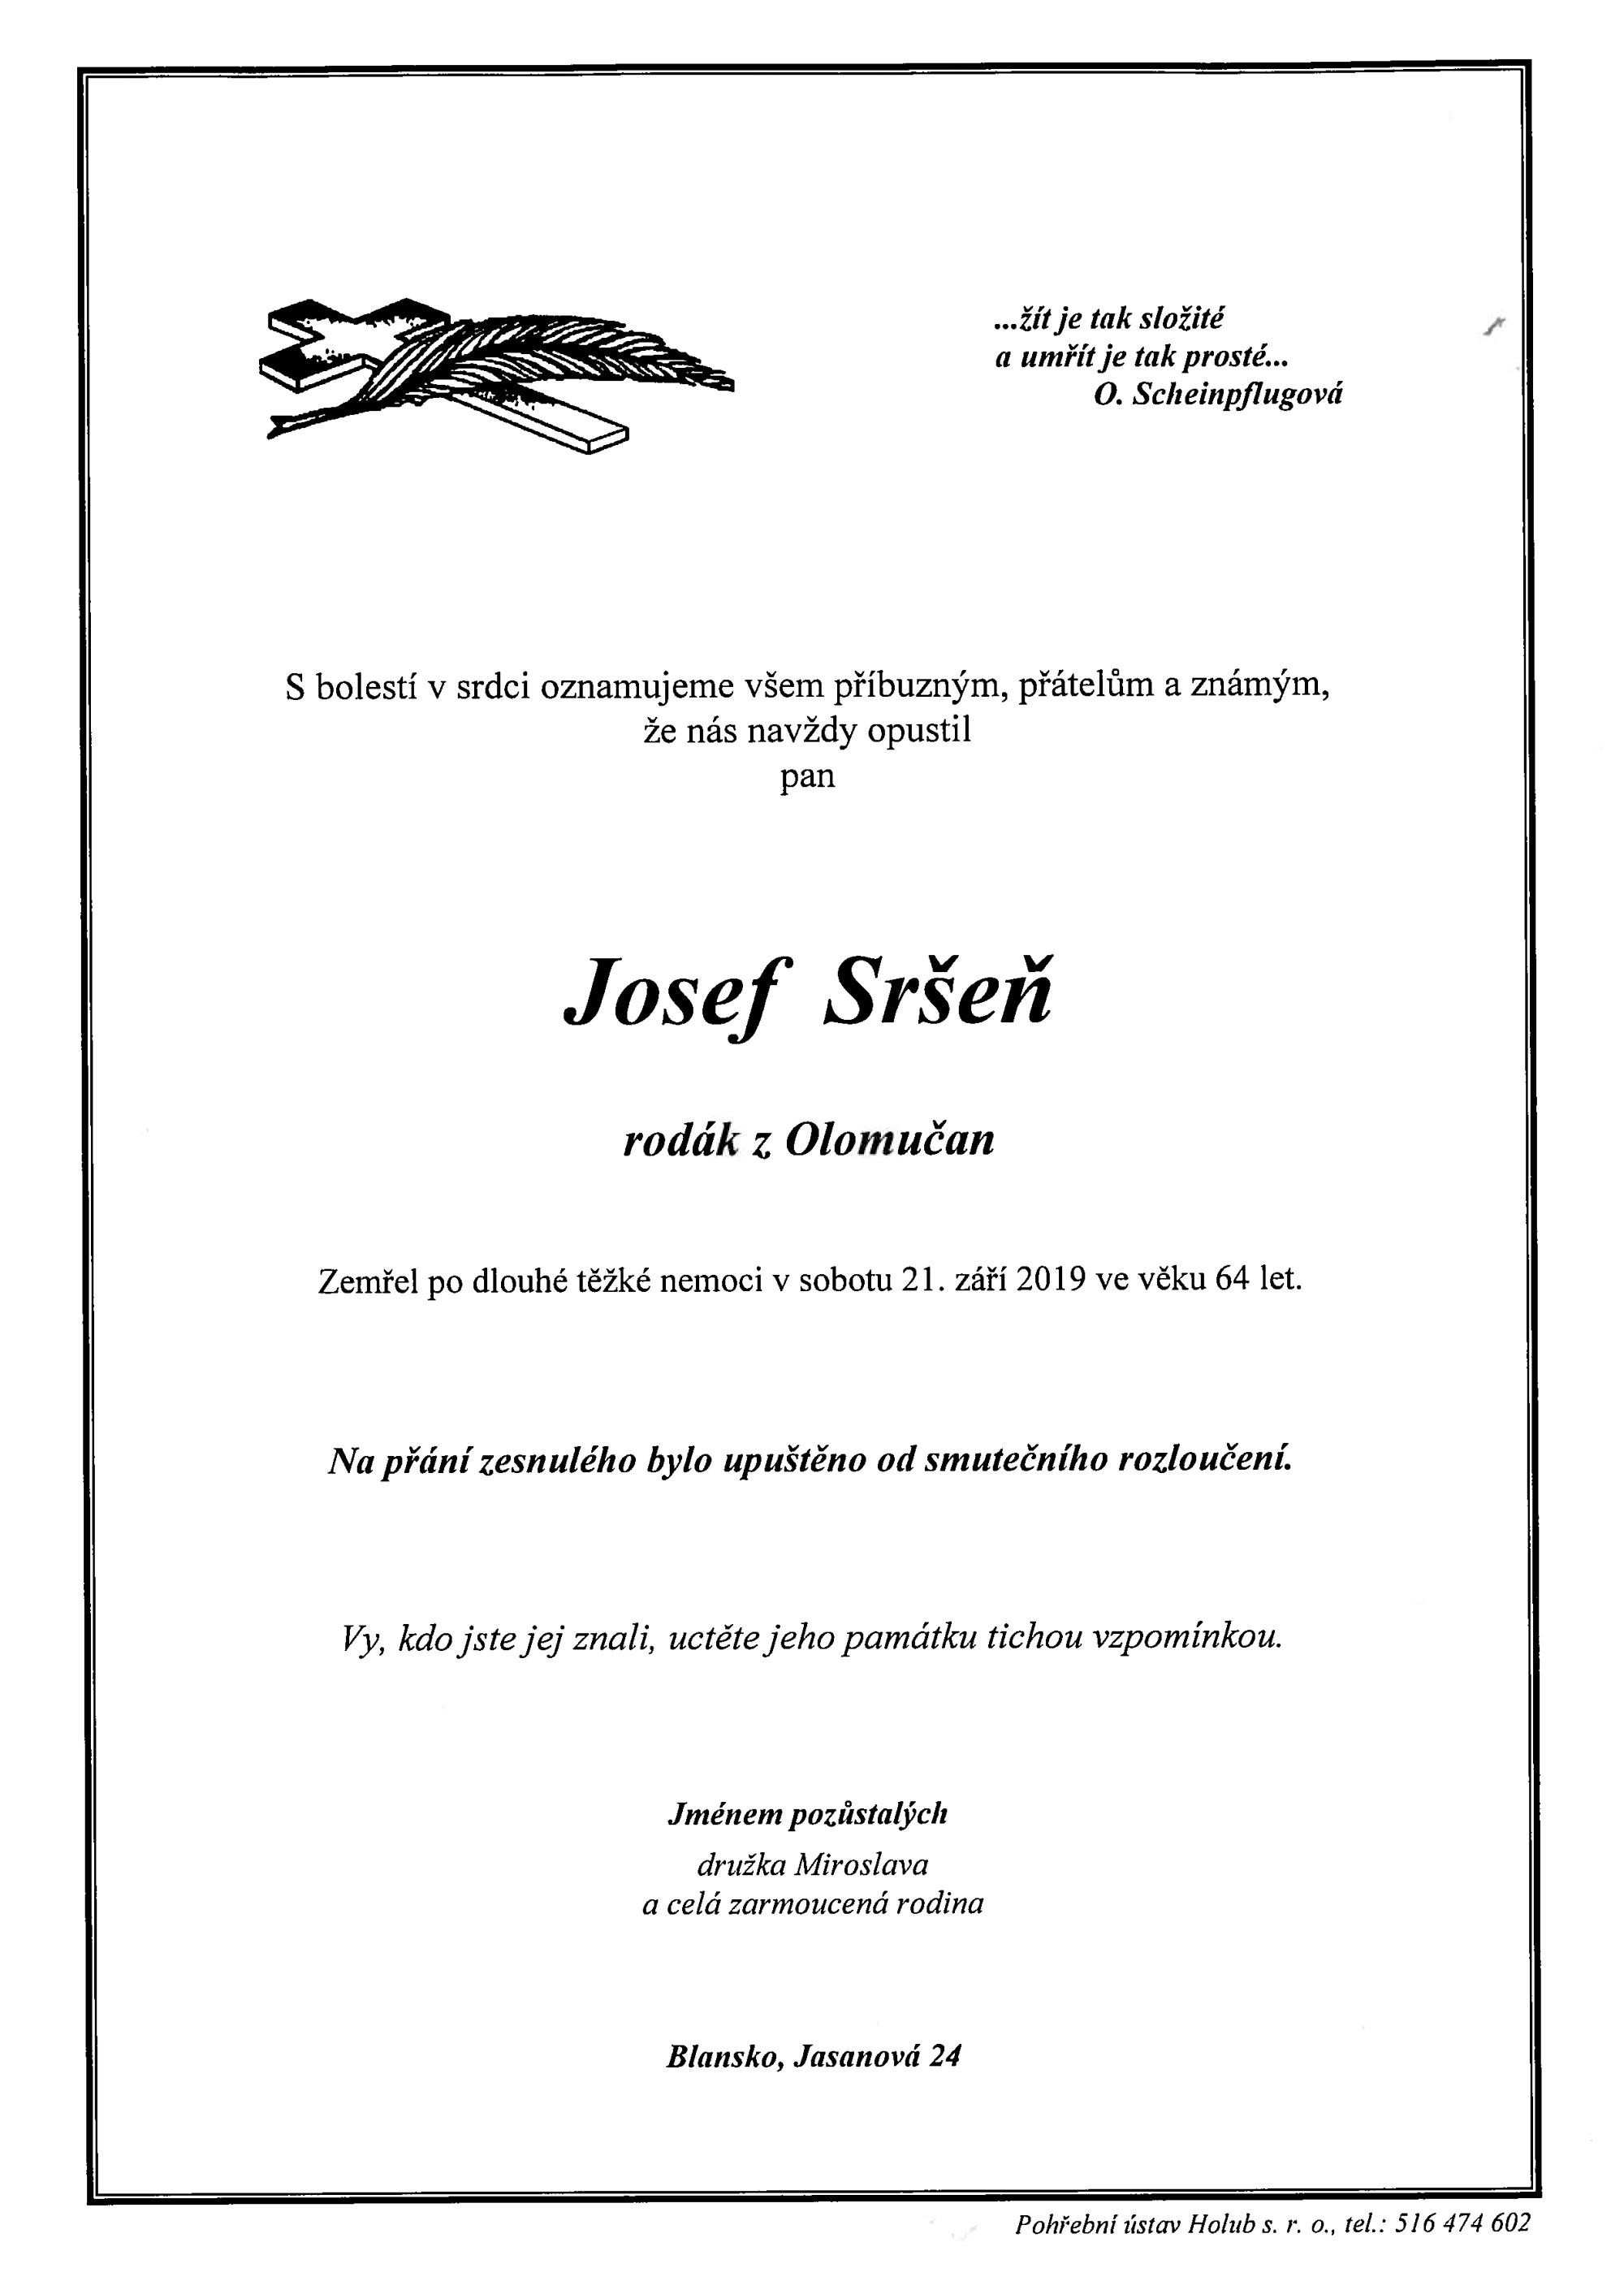 Josef Sršeň